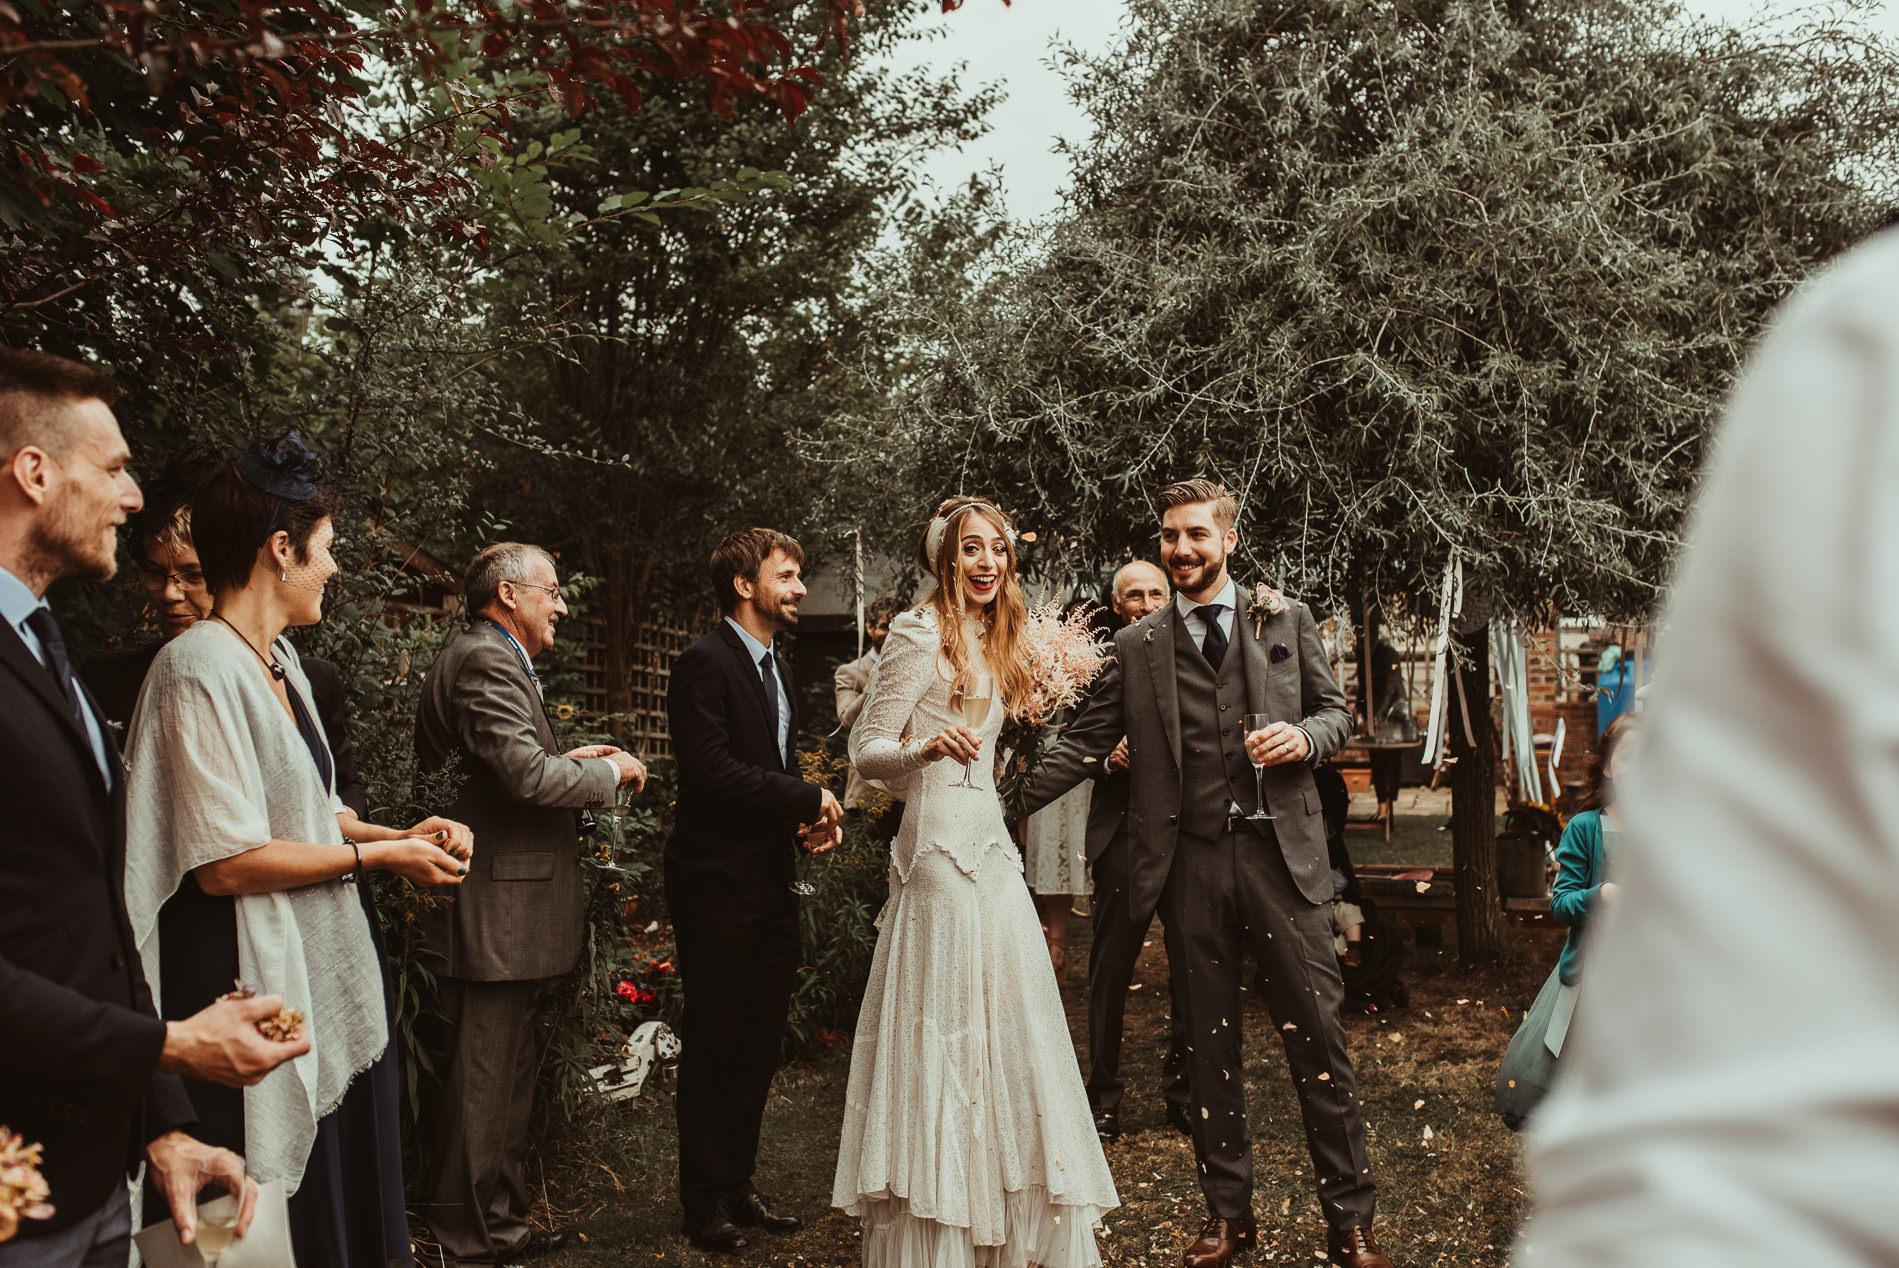 bohemian_wedding_lawshall_church_garden51